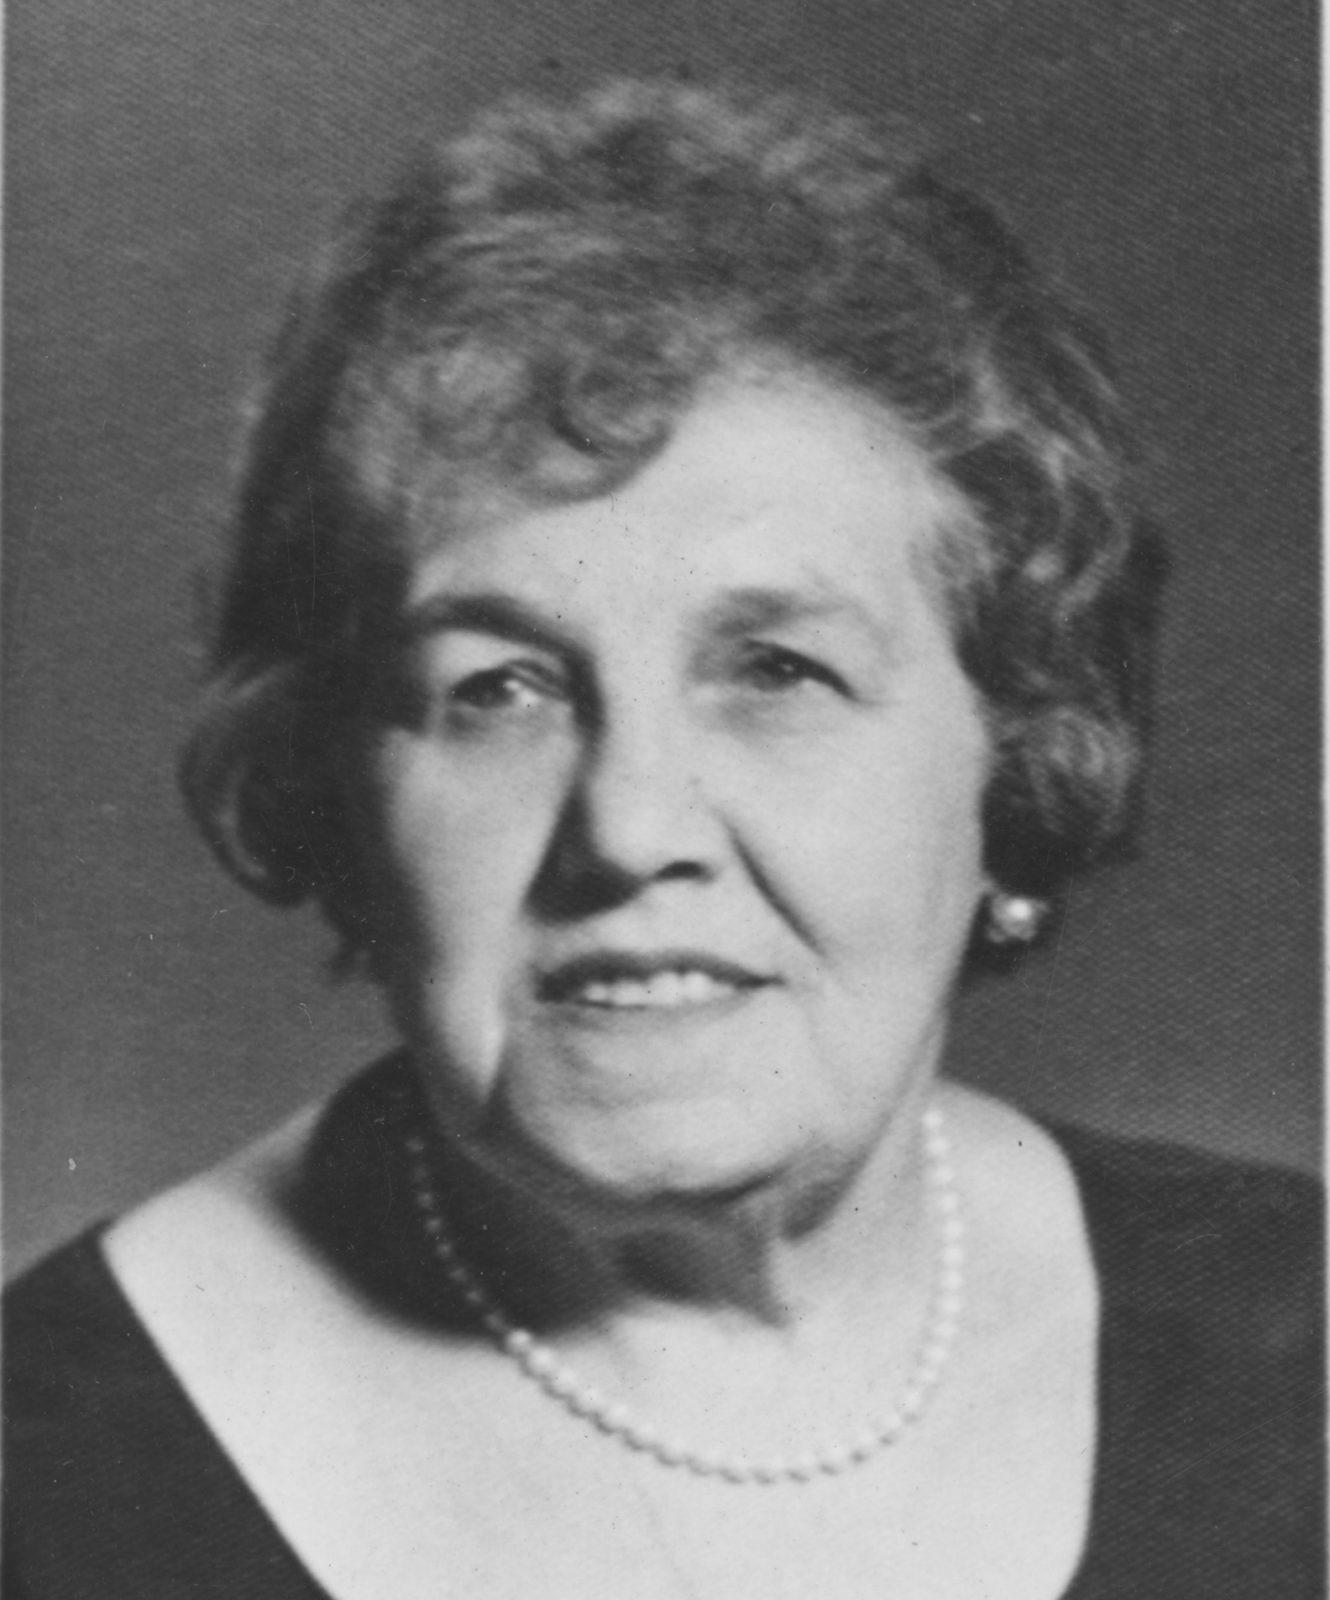 Photo of Bessie Rogarshevsky as an older women.